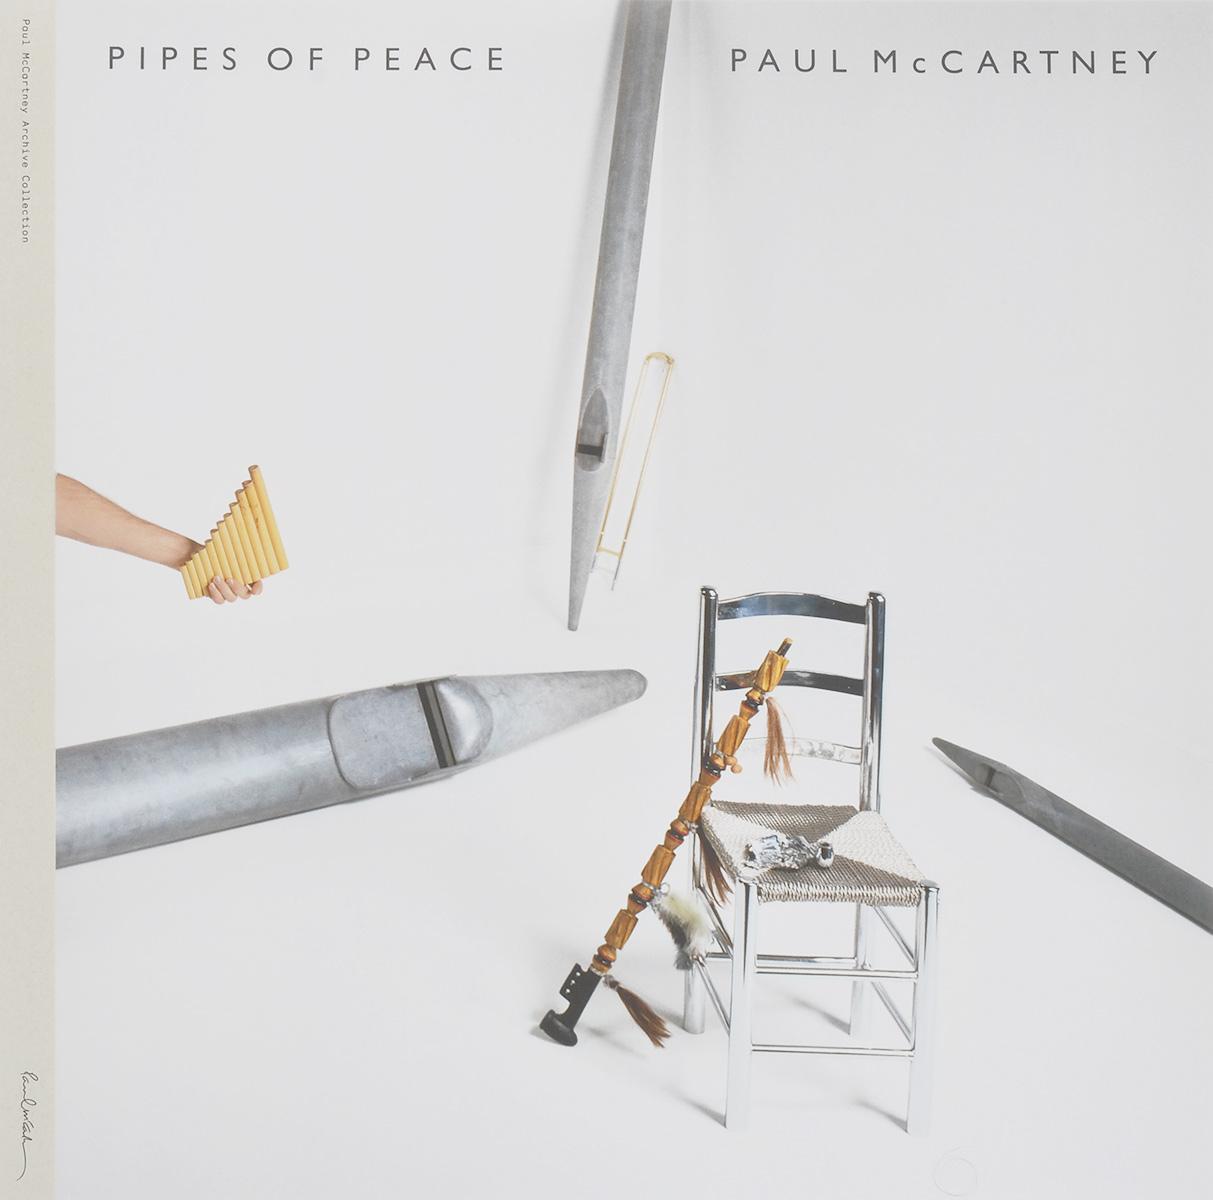 Пол Маккартни Paul McCartney. Pipes Of Peace (2 LP) paul mccartney paul mccartney ocean s kingdom 2 lp 180 gr